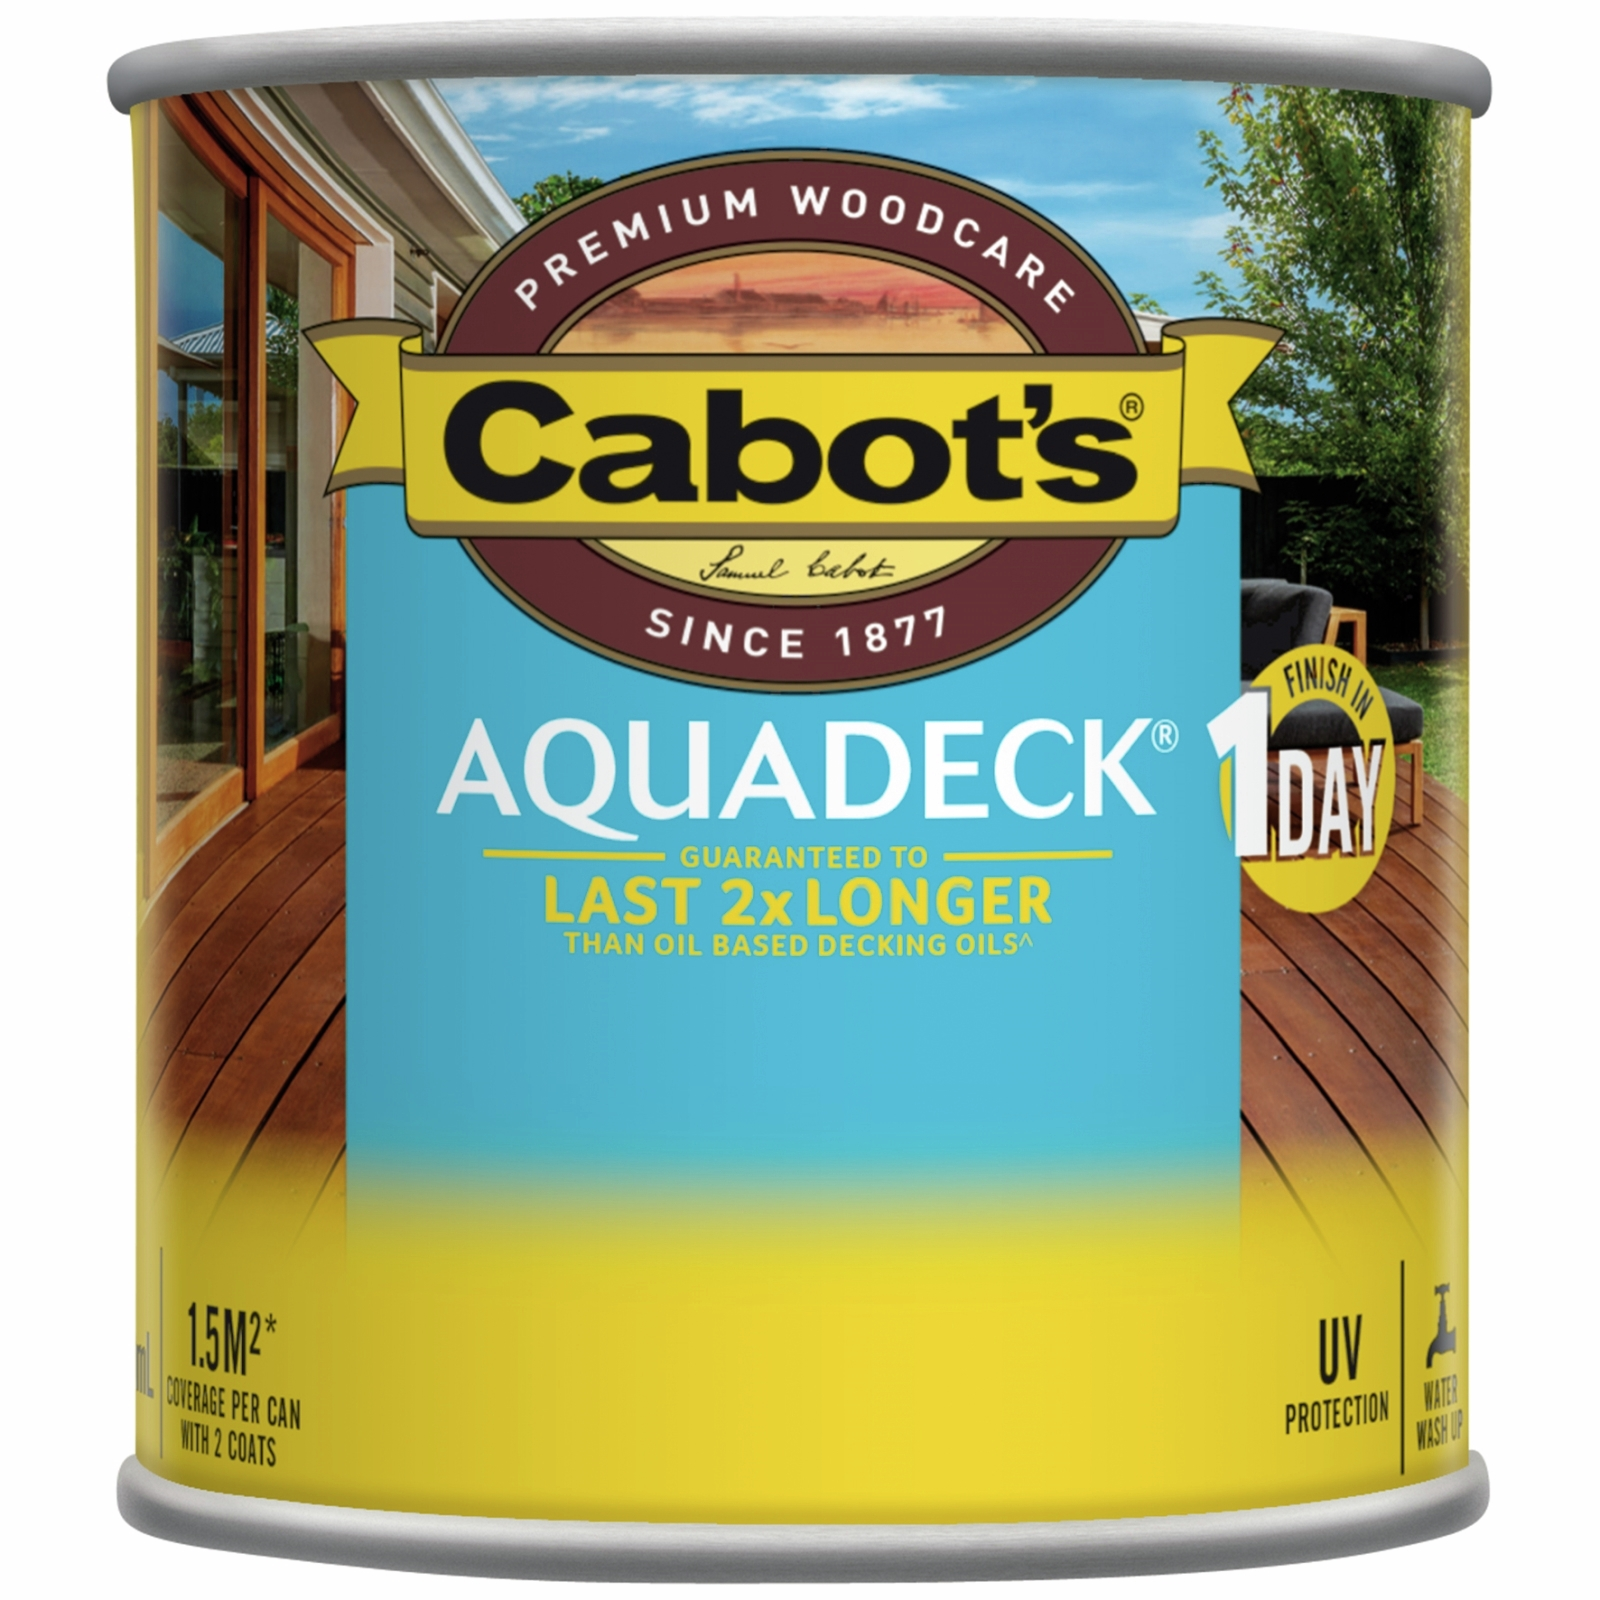 Cabot's 250ml Waterbased Burnt Walnut Aquadeck Decking Oil